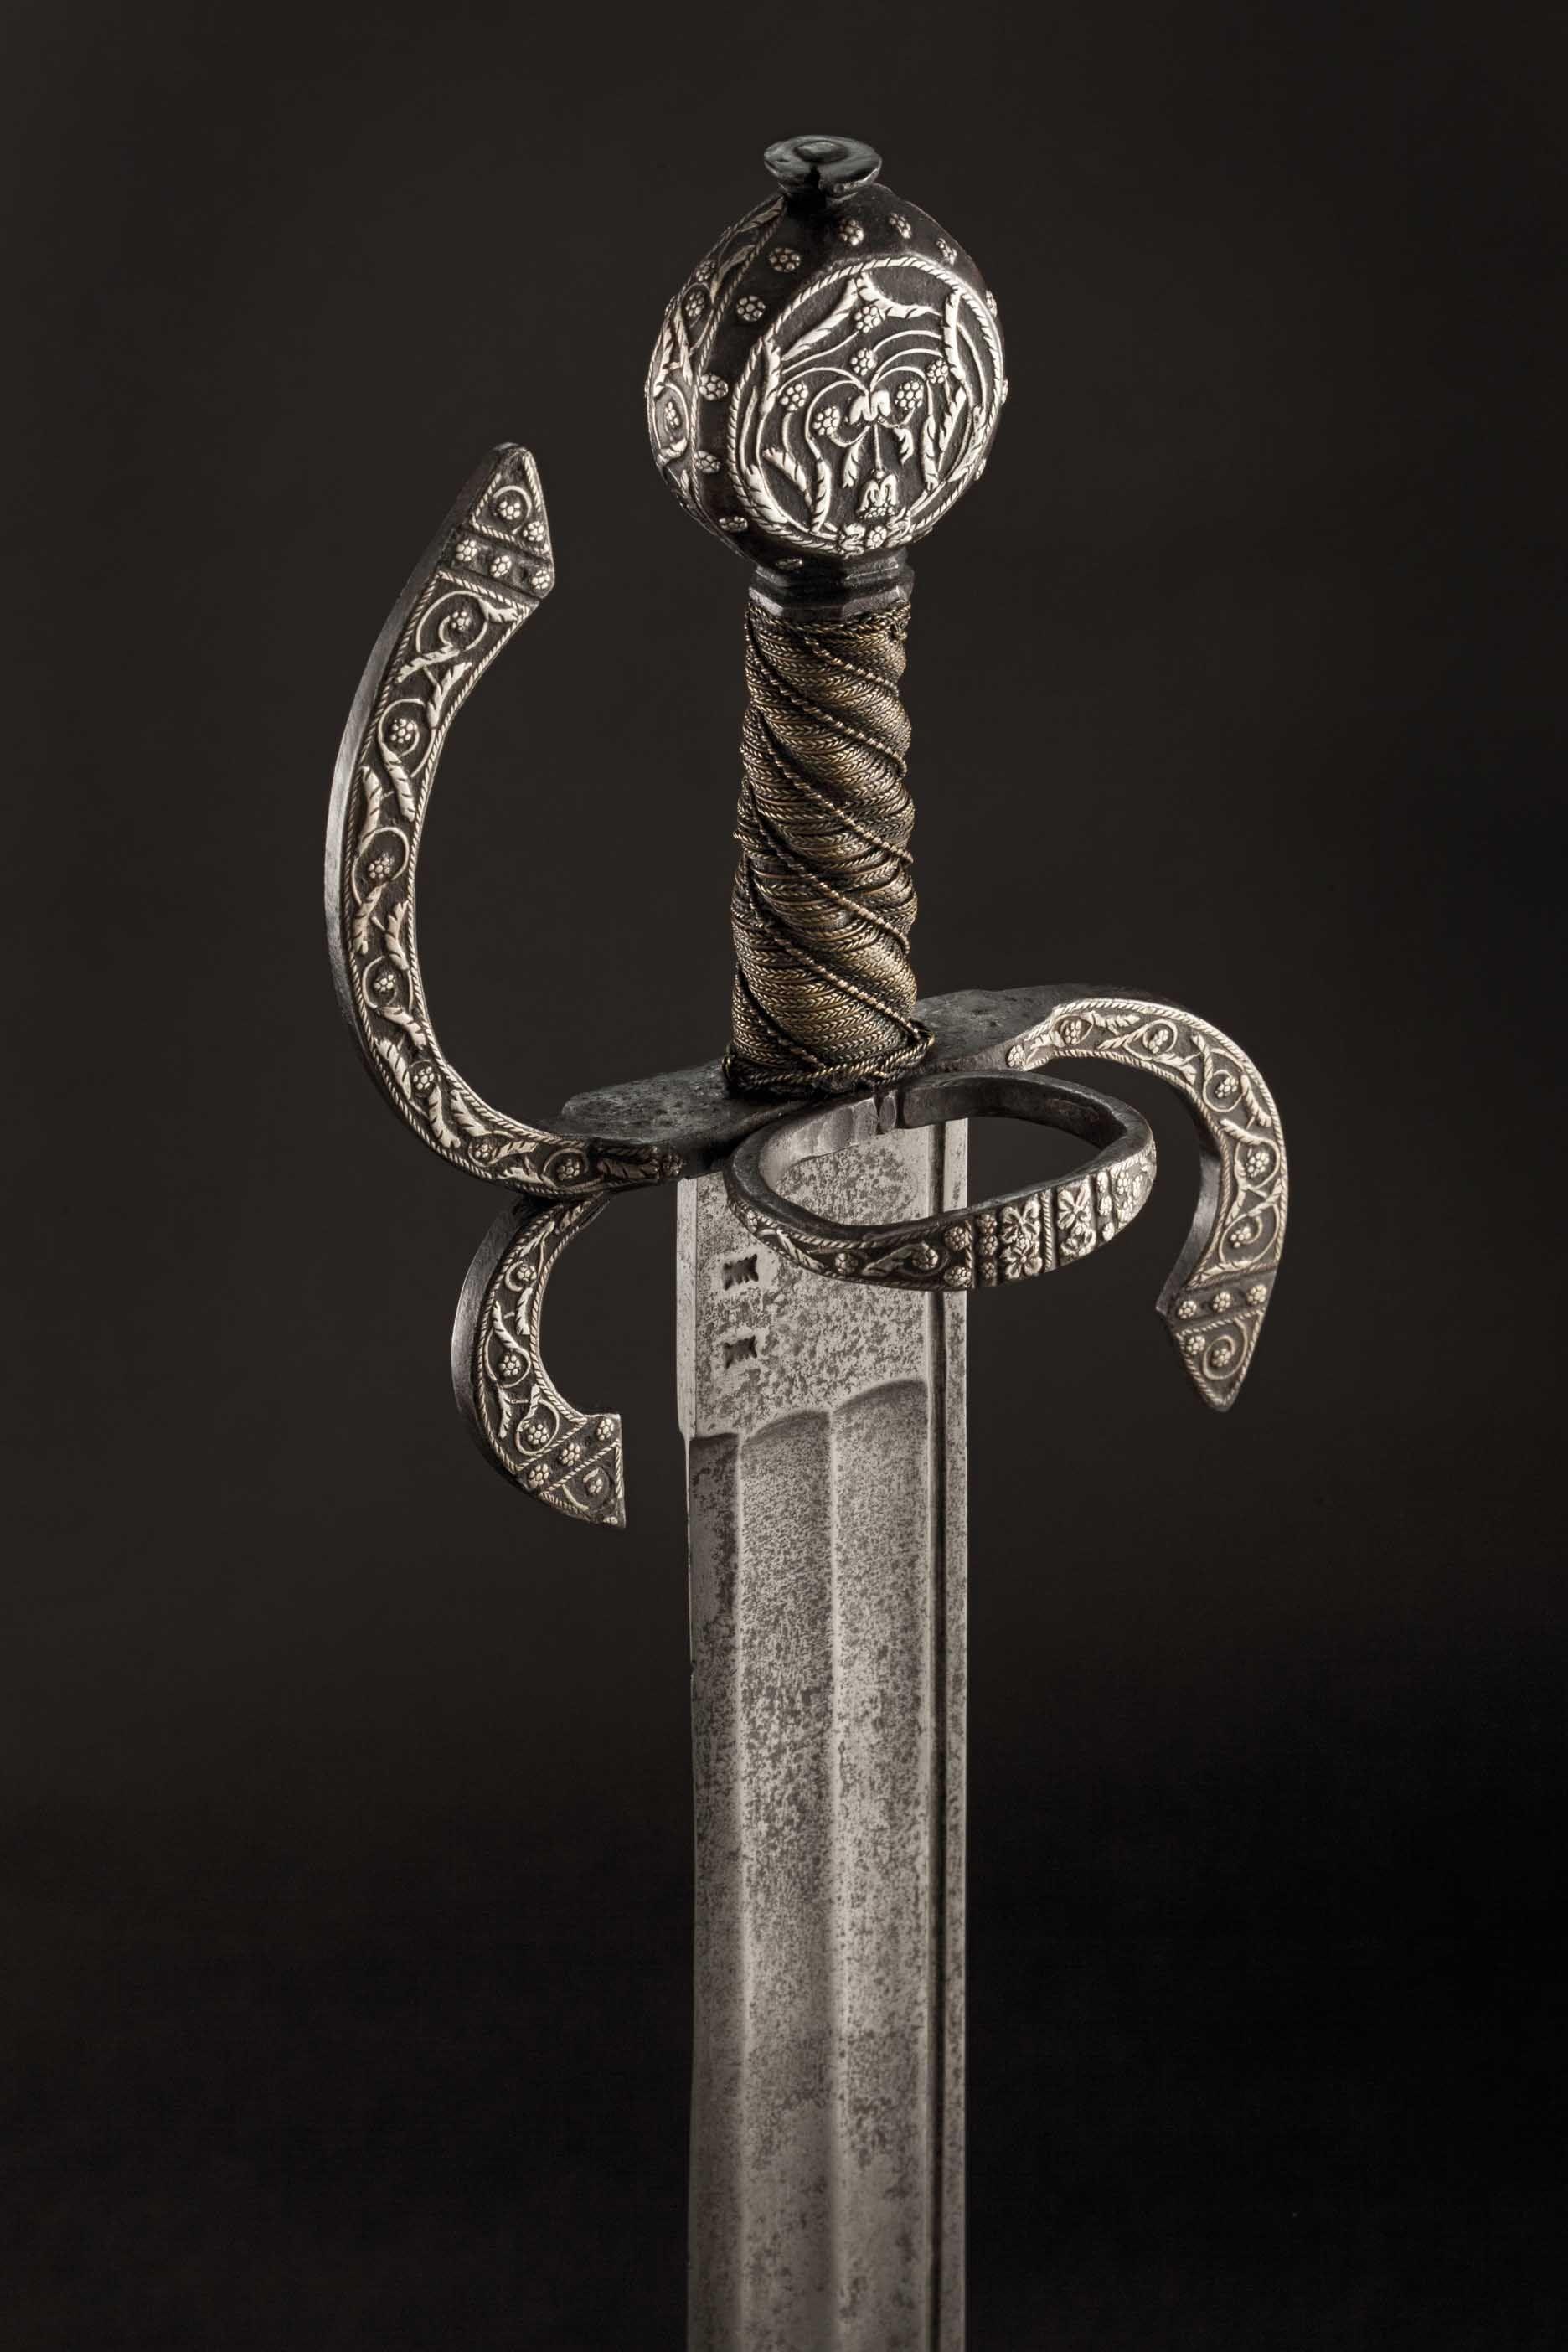 An Italian Silver Inlaid Storta Circa 1600 Lot Detail Hermann Historica Ohg Silber Italien Schwert